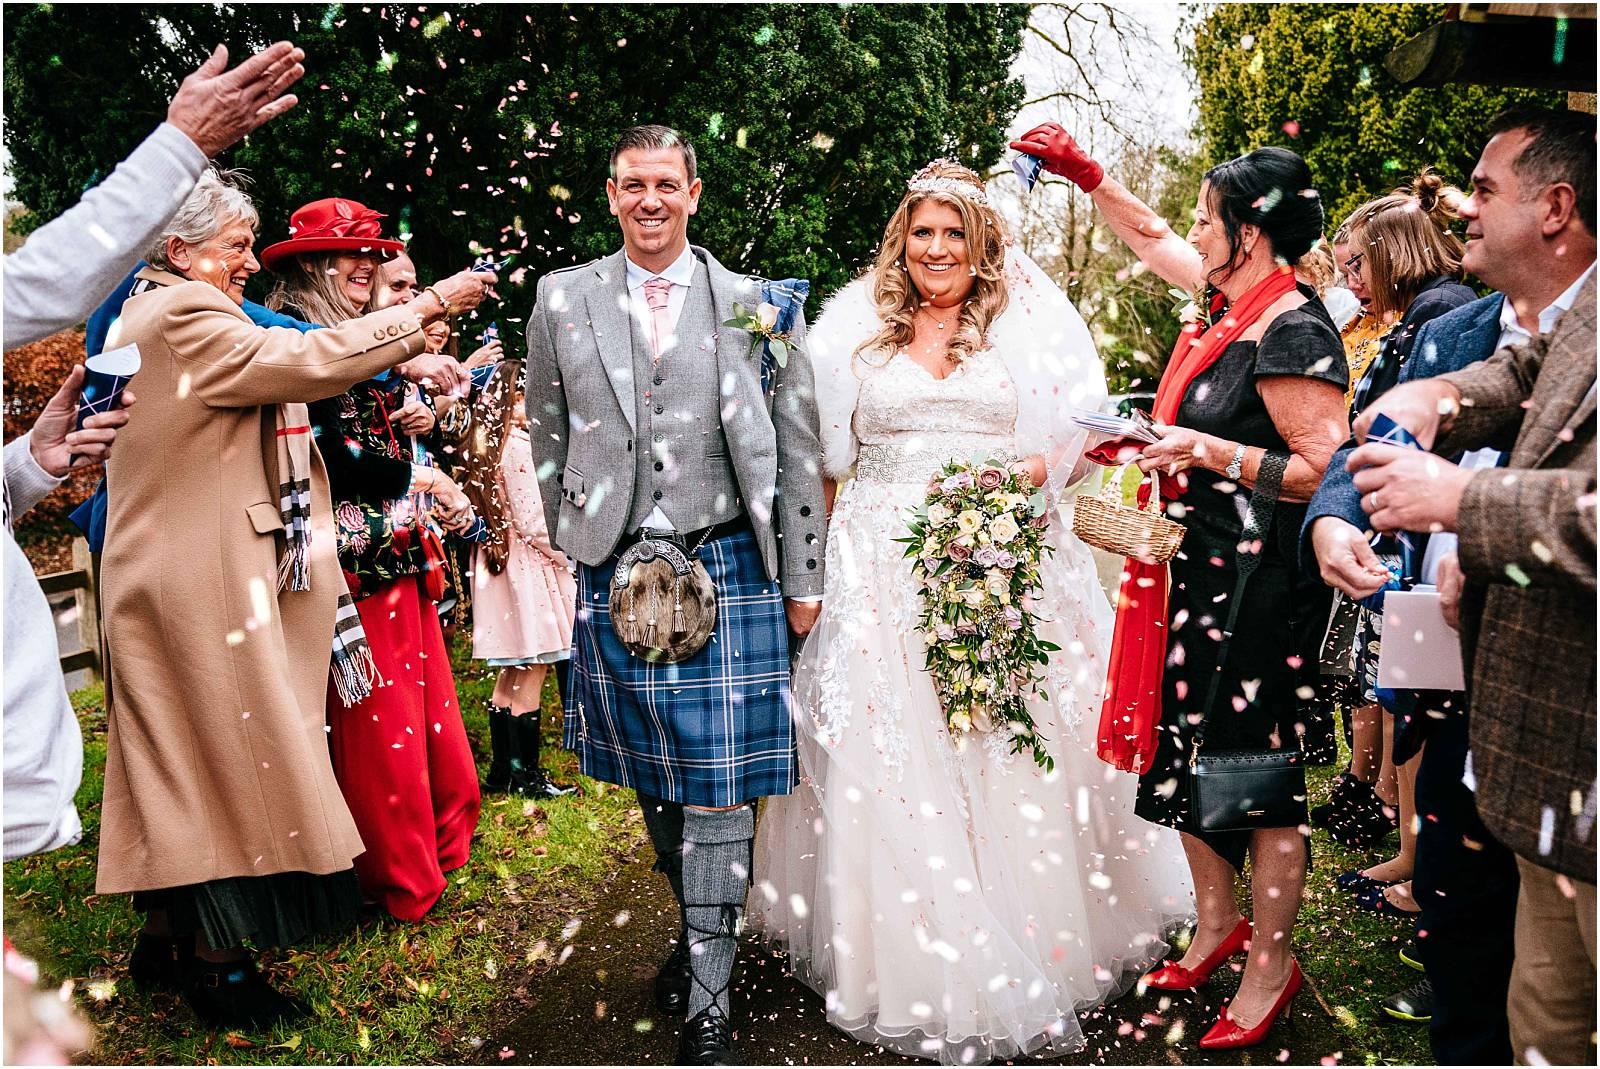 Cain Manor Wedding Photography – Kerry & William's Winter Wedding